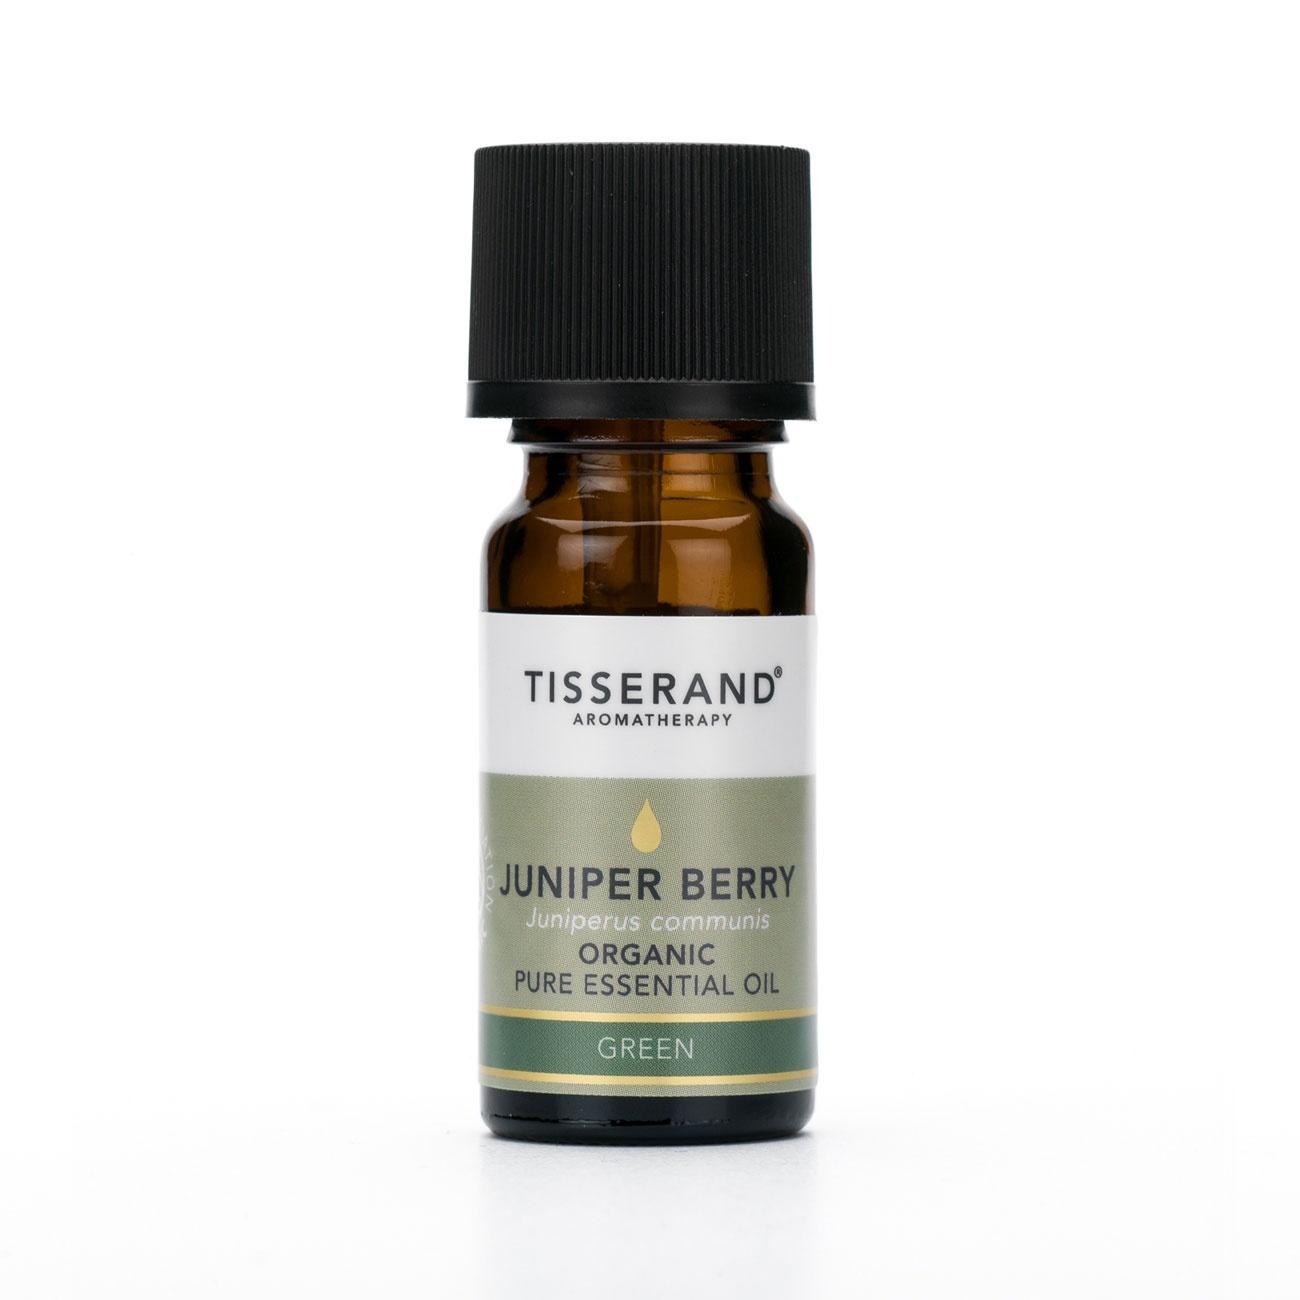 Tisserand Juniper Berry Essential Oil 9ml